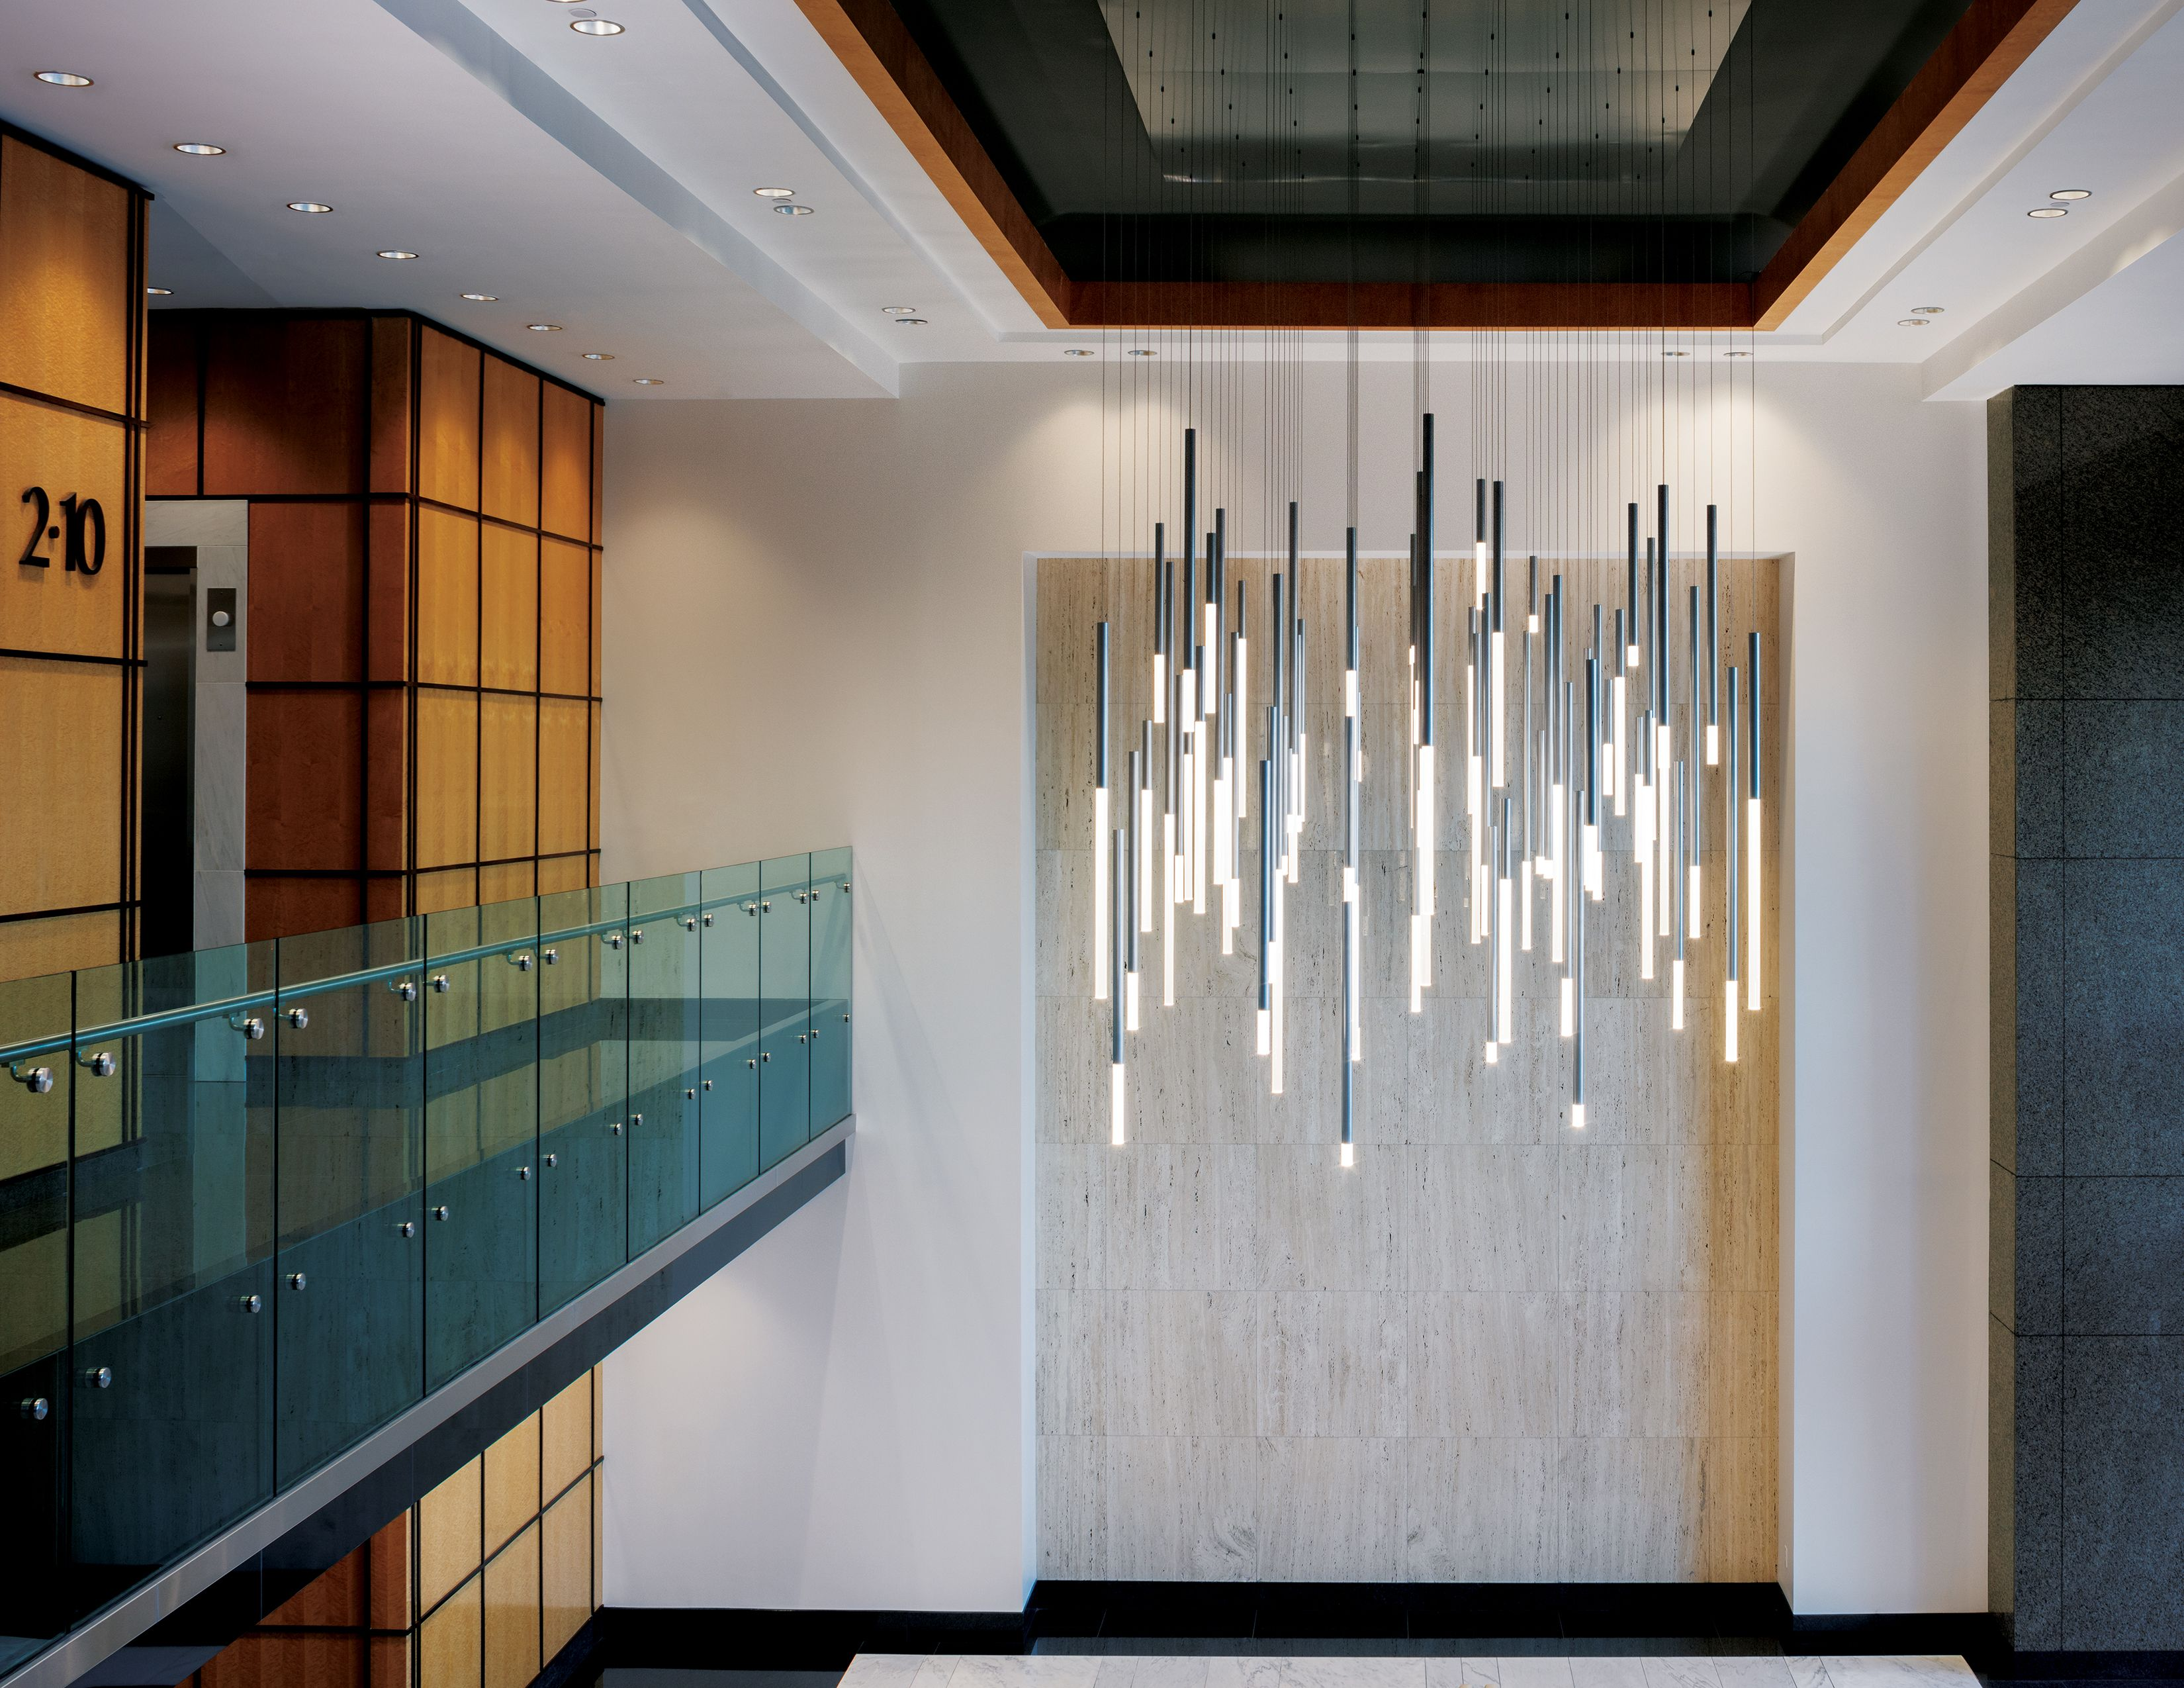 Glowstick Cer Ocl Architectural